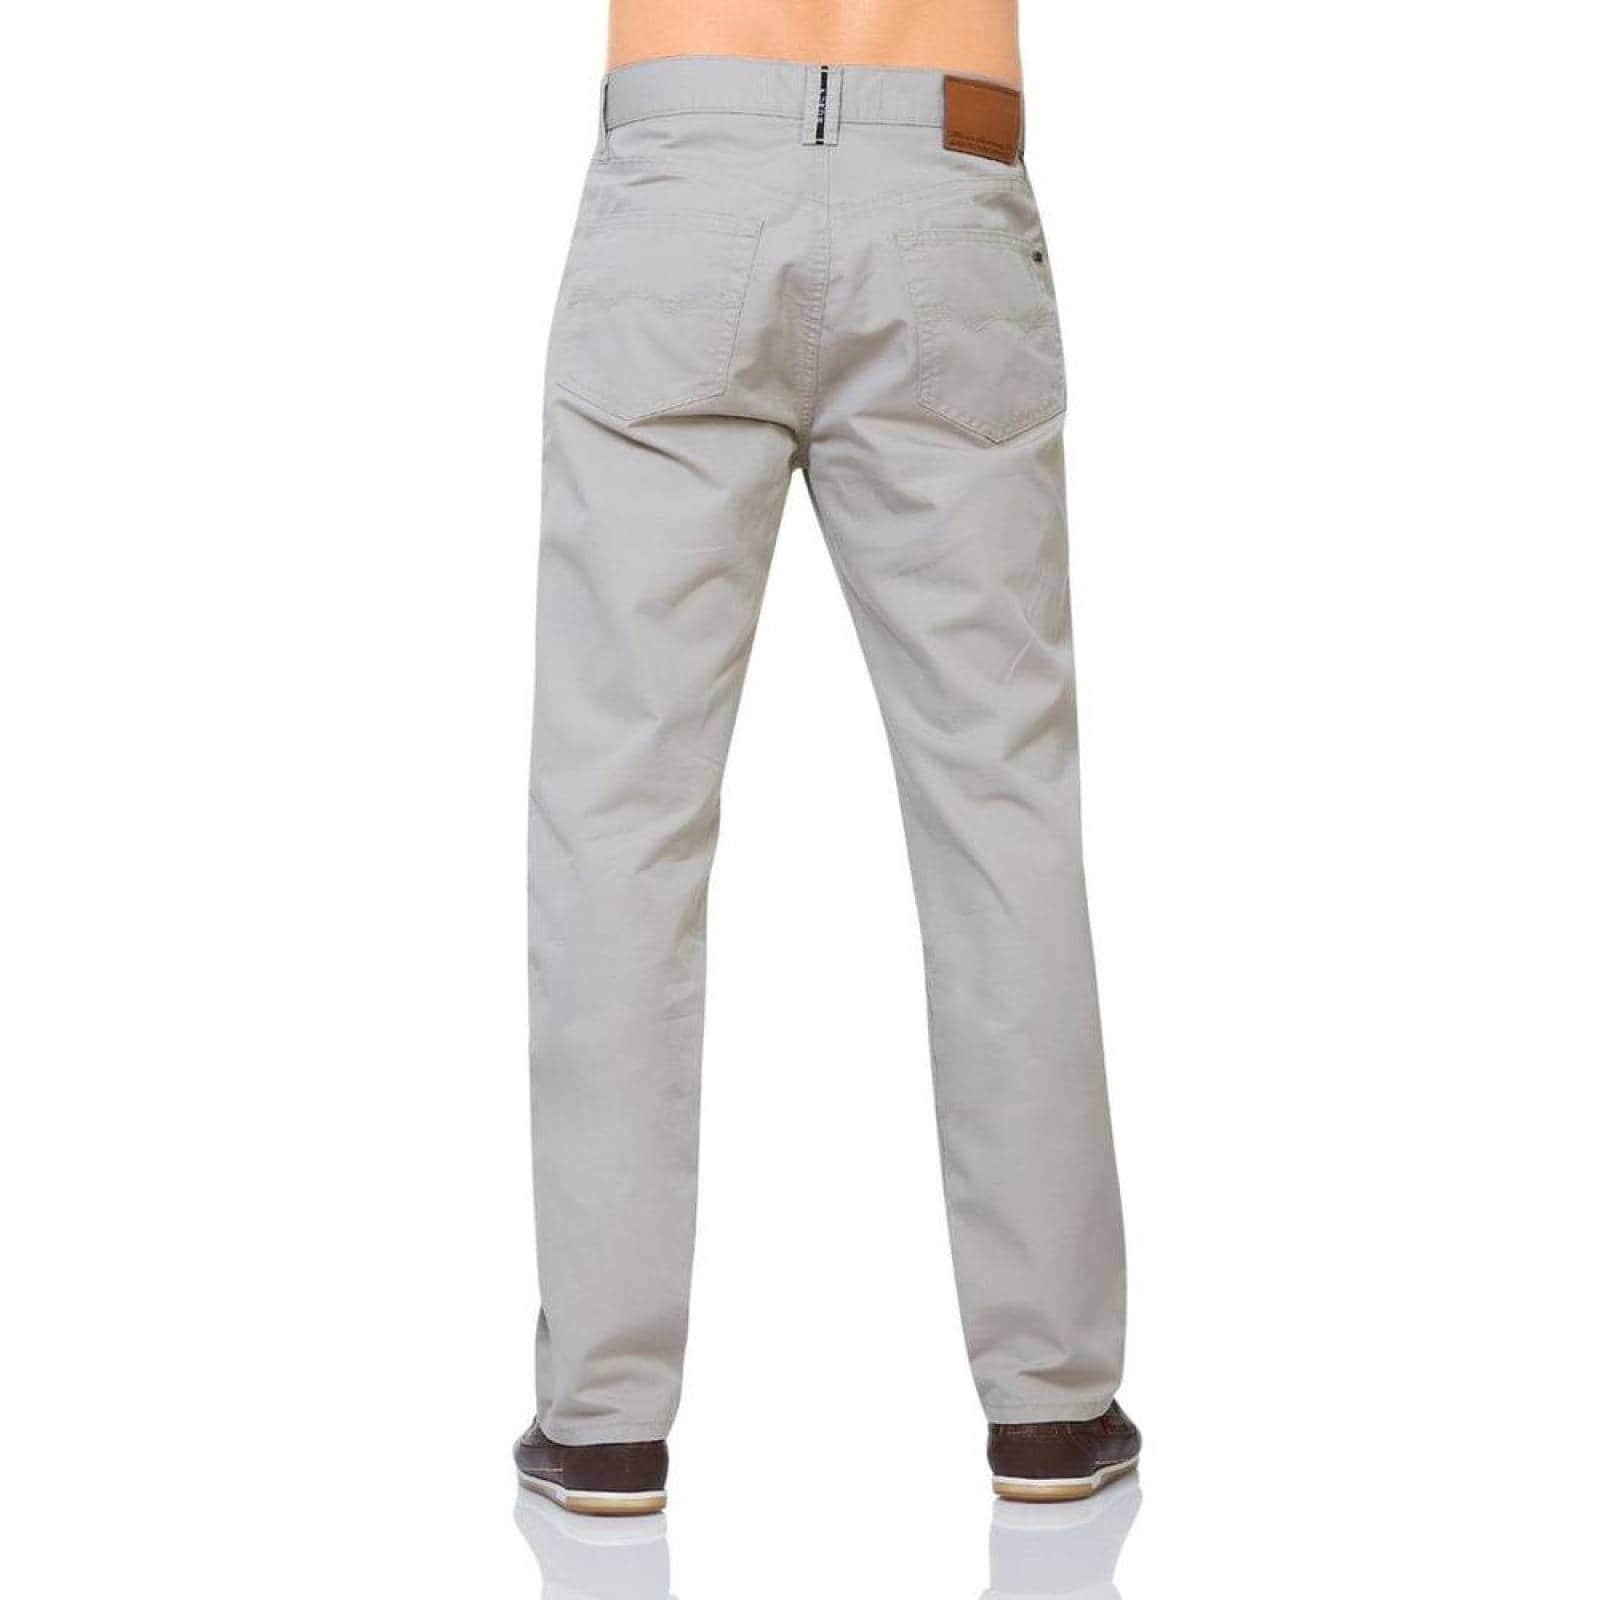 Pantalon Casual Hombre Furor Champagne 62103802 Gabardina